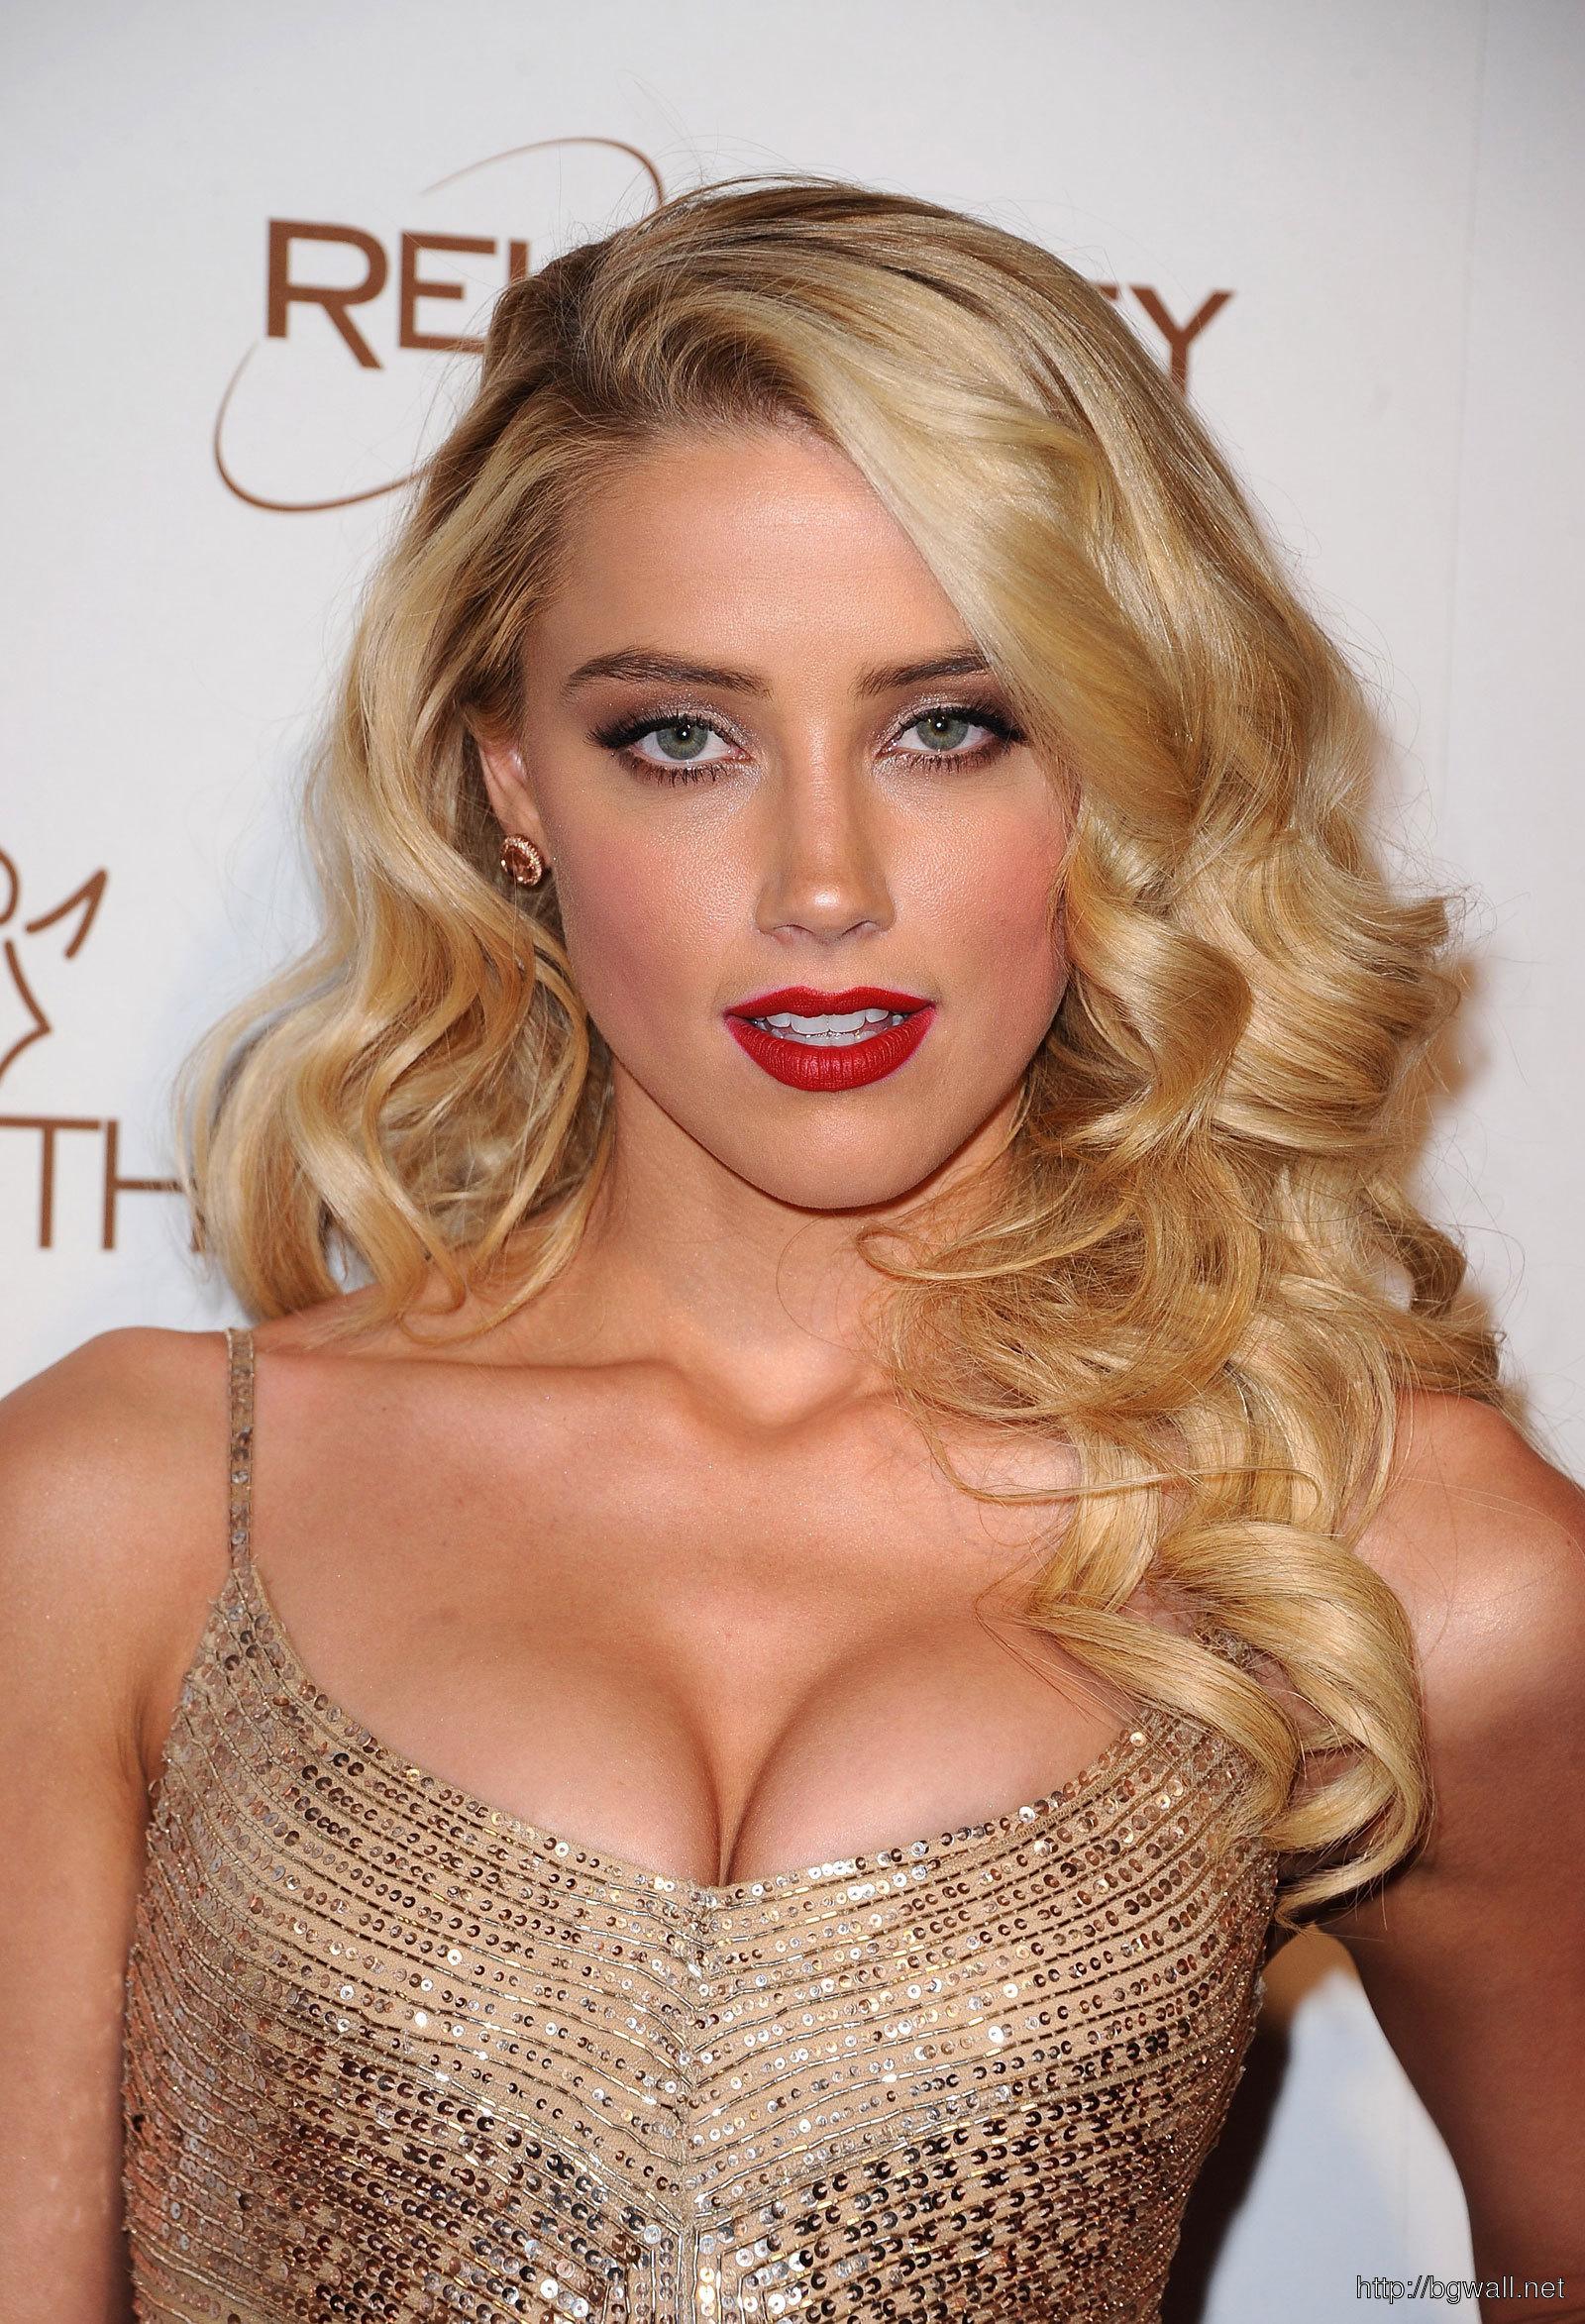 Amber Heard At Art Of Elysium Heavan Gala In Los Angeles Full Size